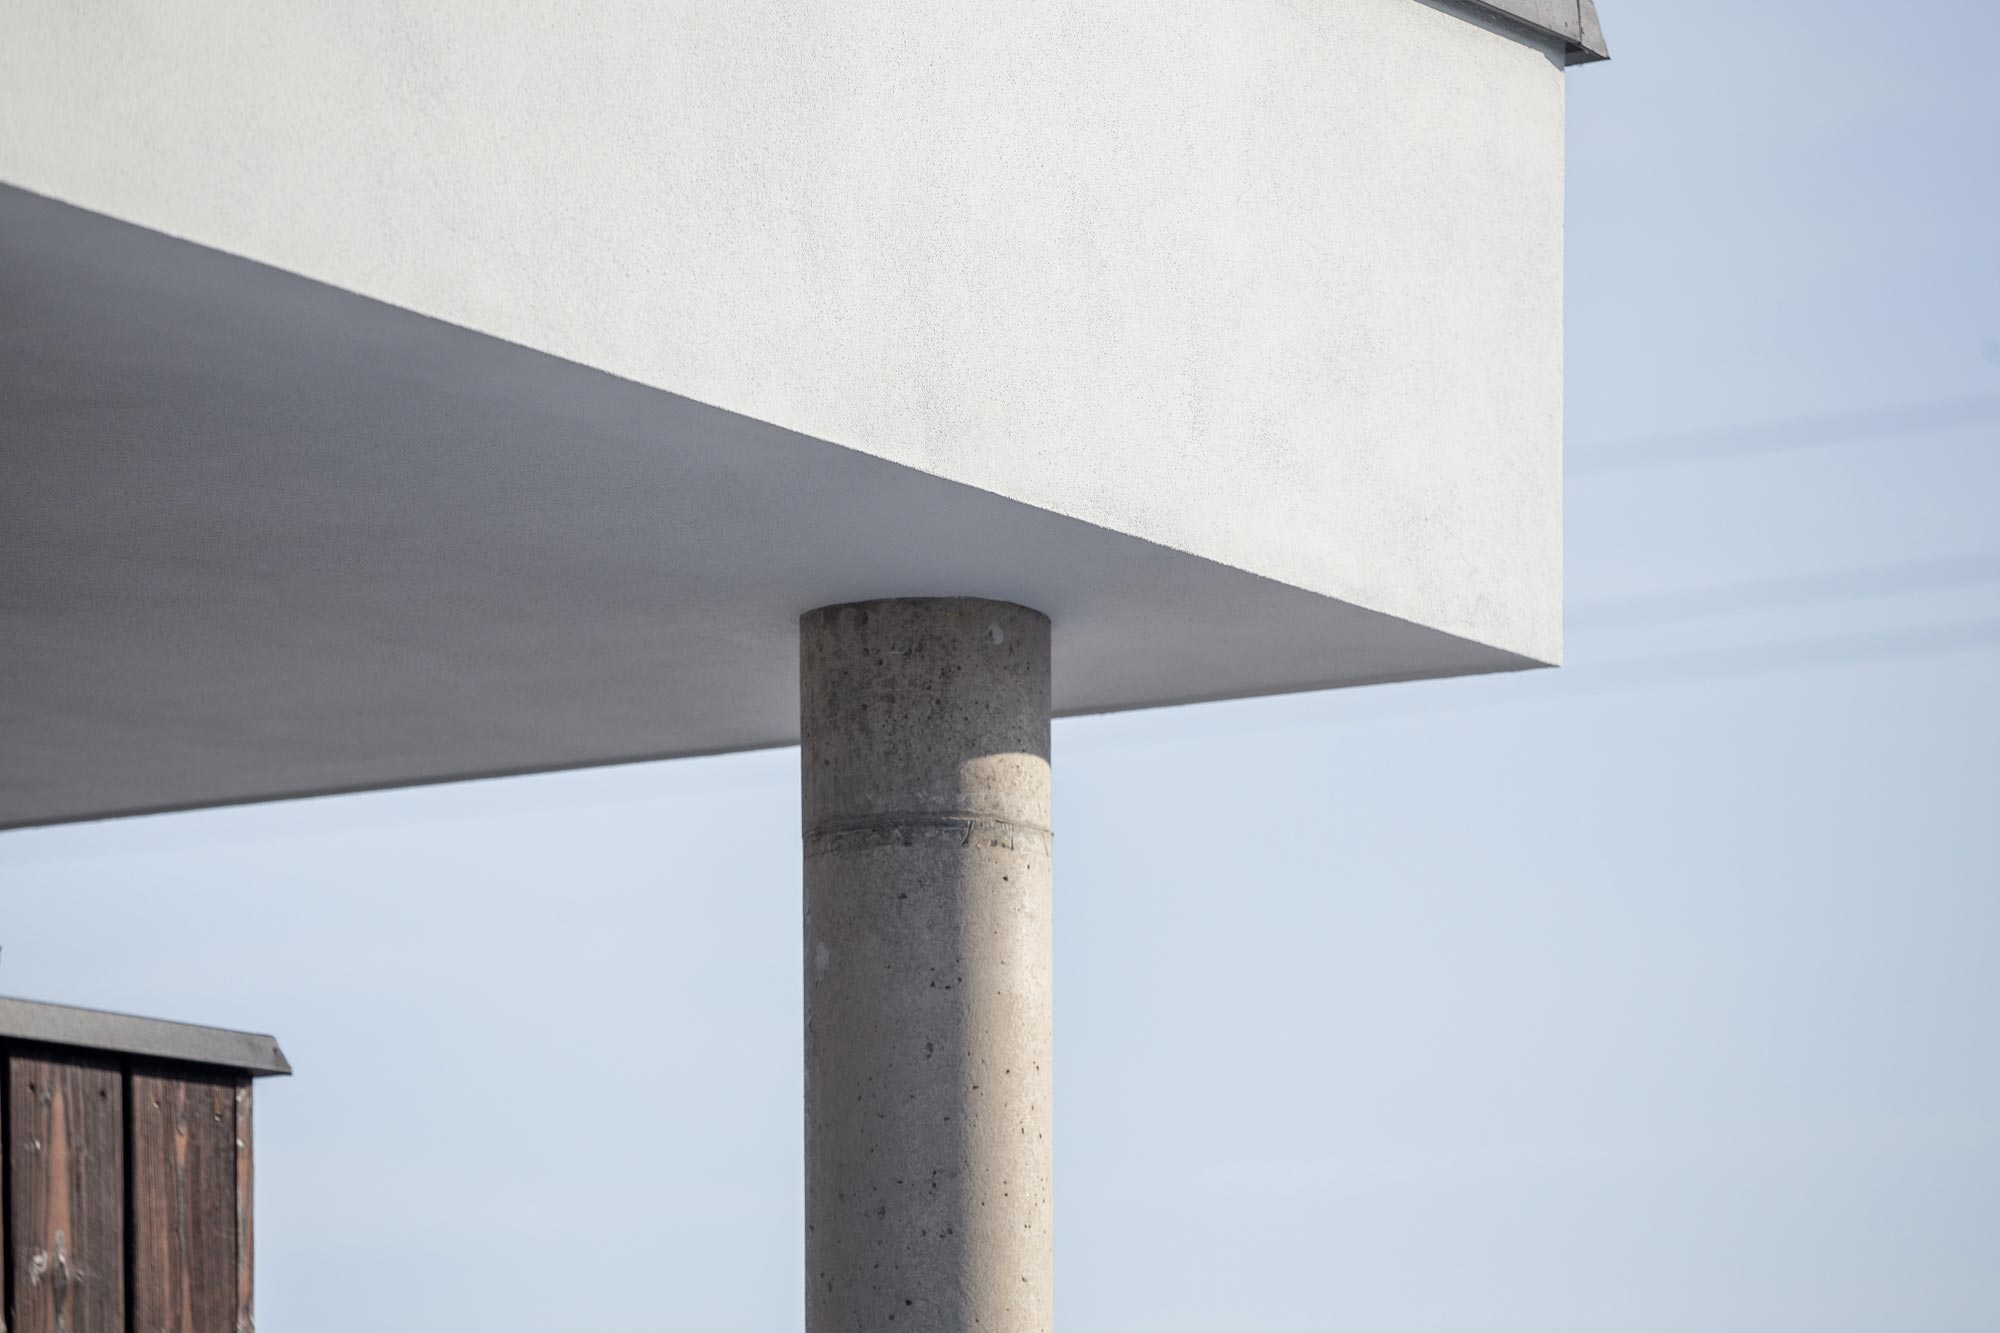 kubinio-metro-architektai_siaures-namas_08